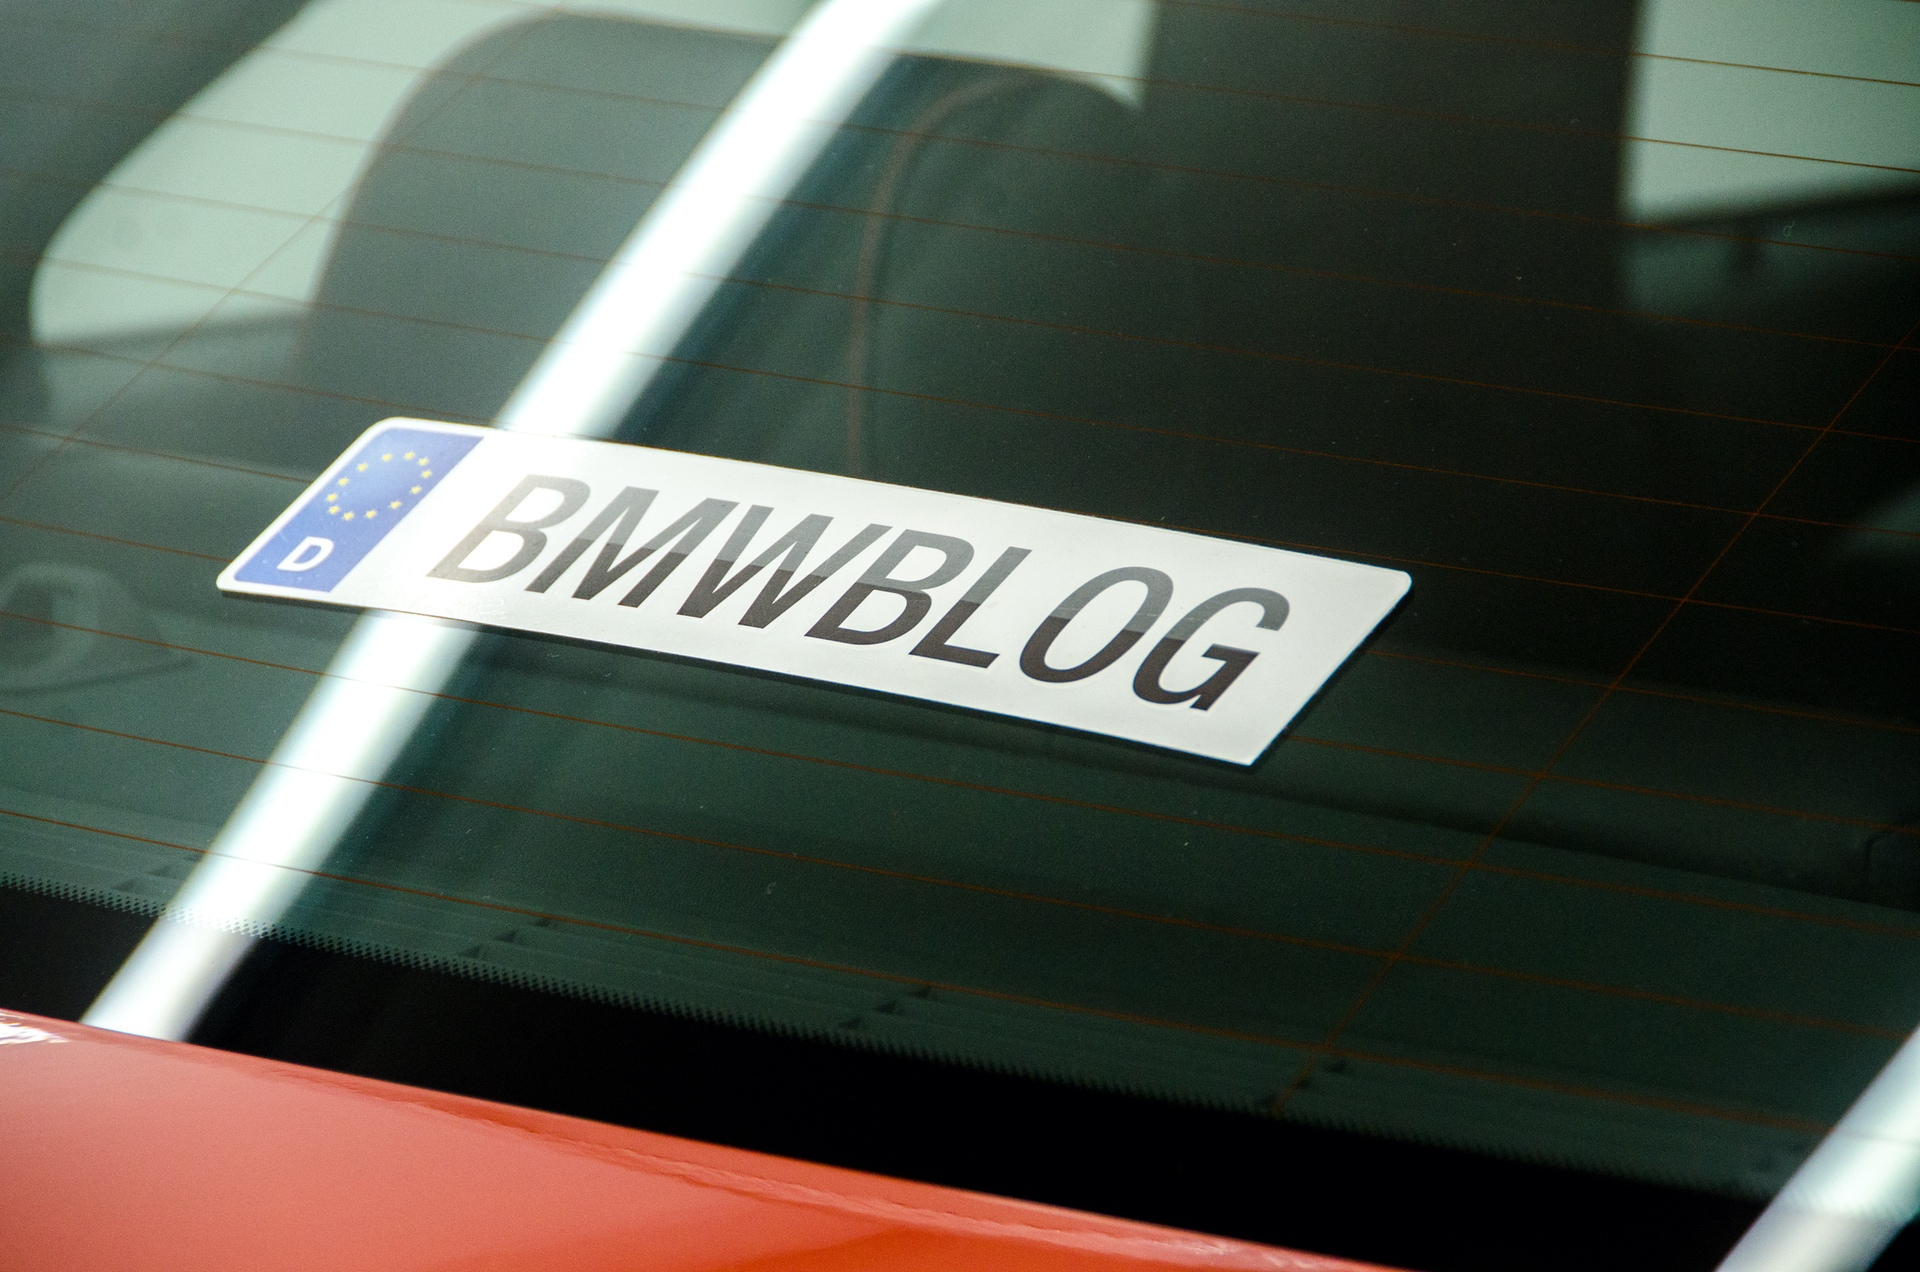 1m bmw blog back decal